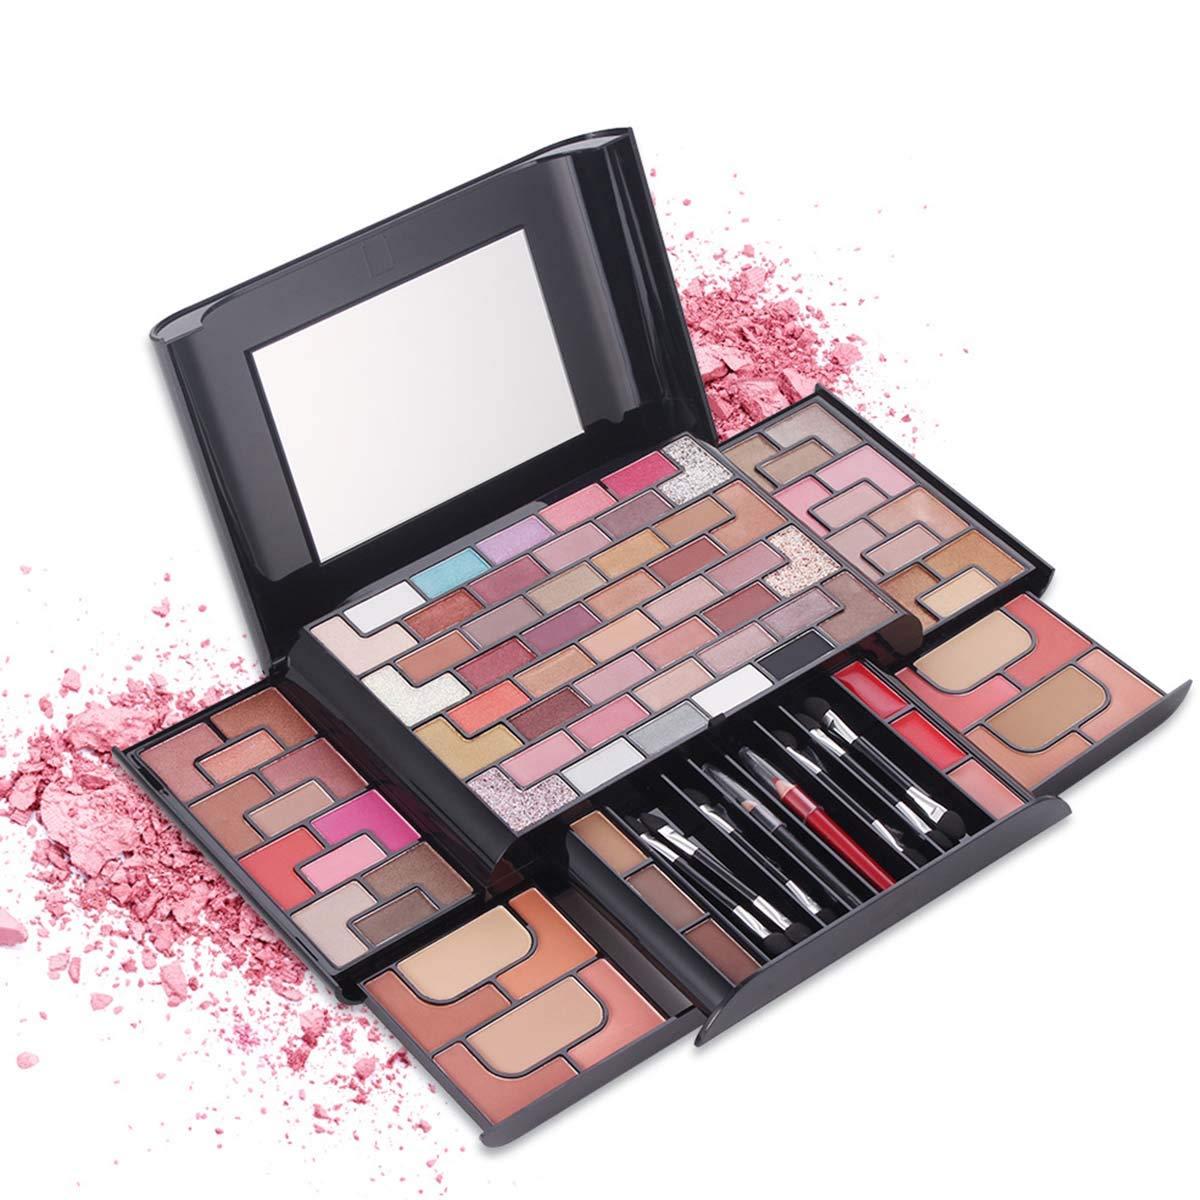 Gojiny Beauty Makeup Kit Professional Makeup Set Eye Shadow Pallet Lipstick Blush Brushes Multifunctional Cosmetic Tool-86 Colors (7002-379N)